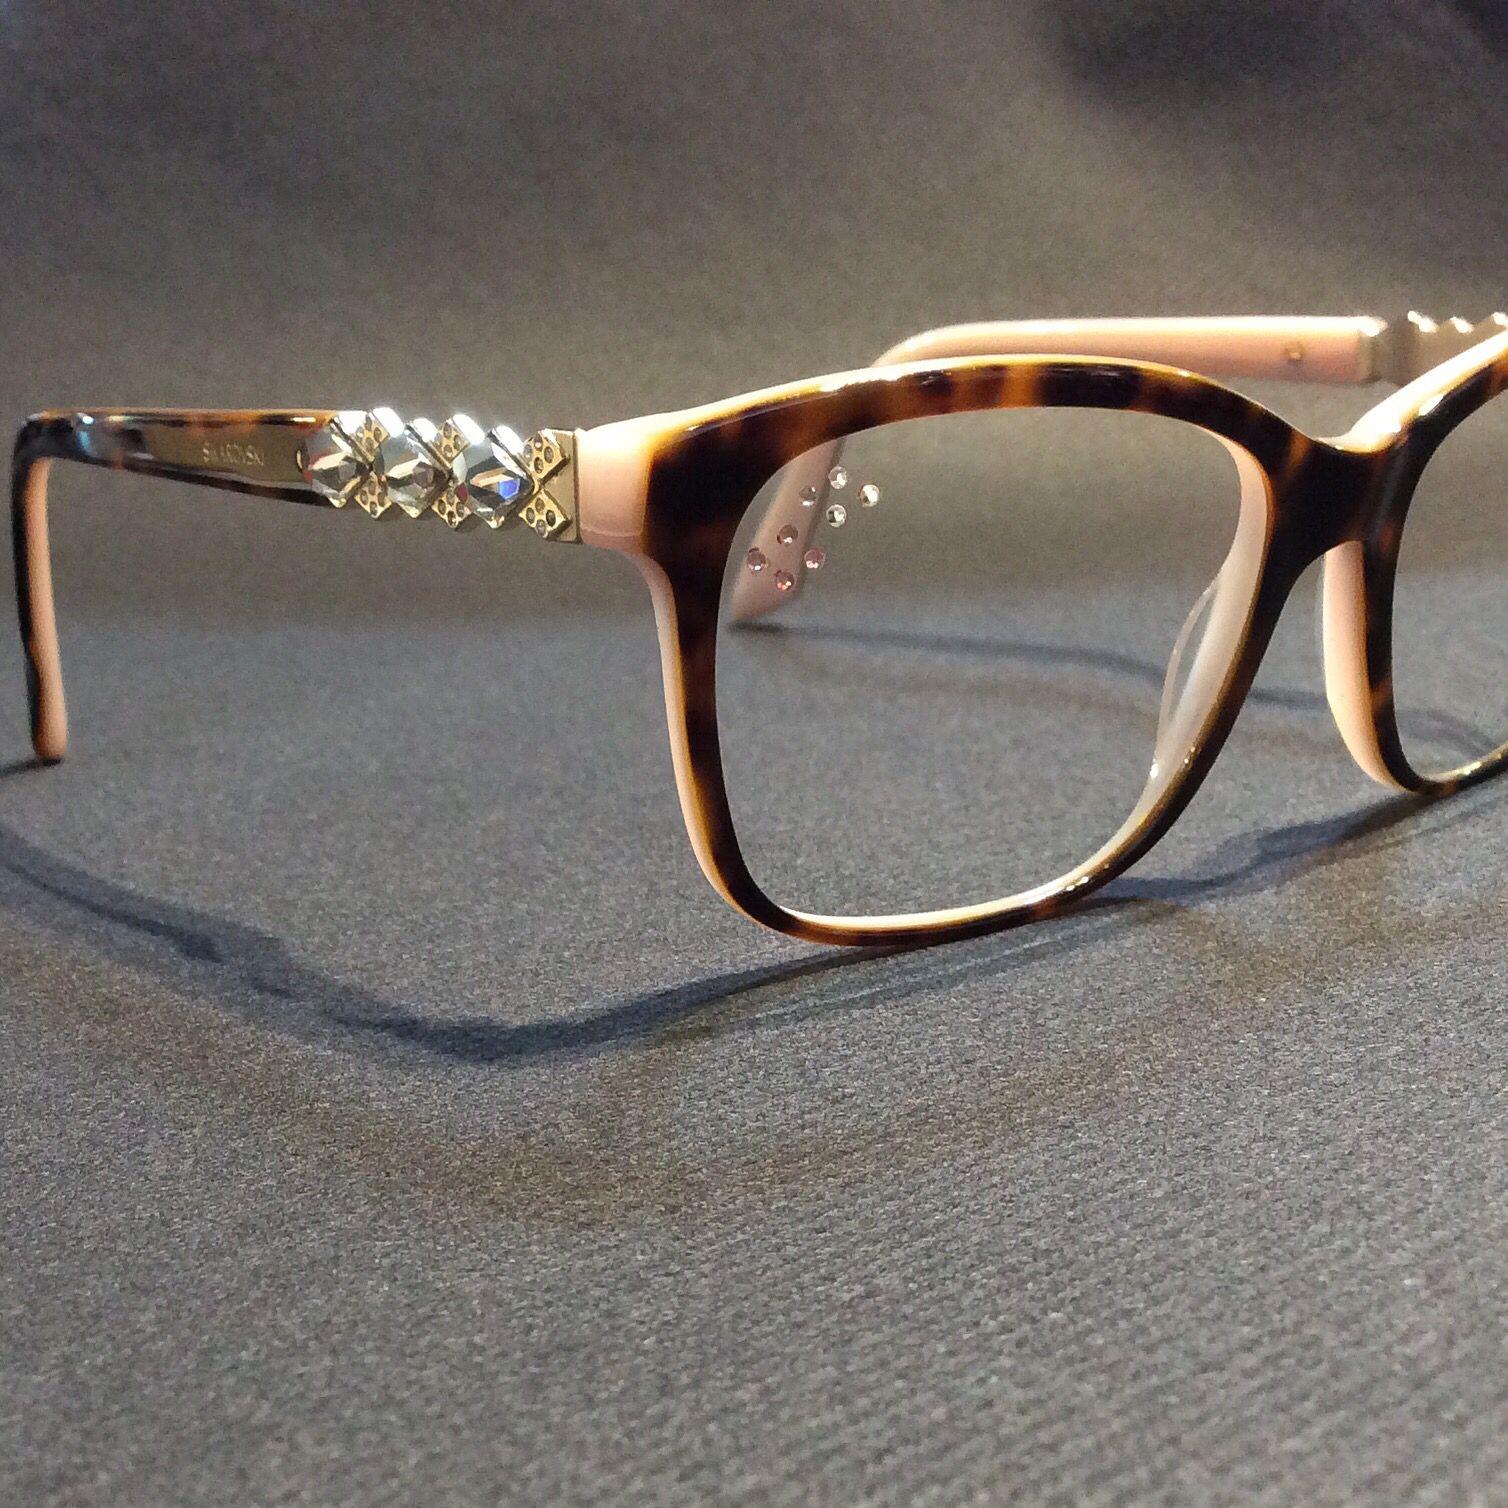 Optique 10/10. Strass Swarovski sur lunettes Swarovski...@swarovski ...